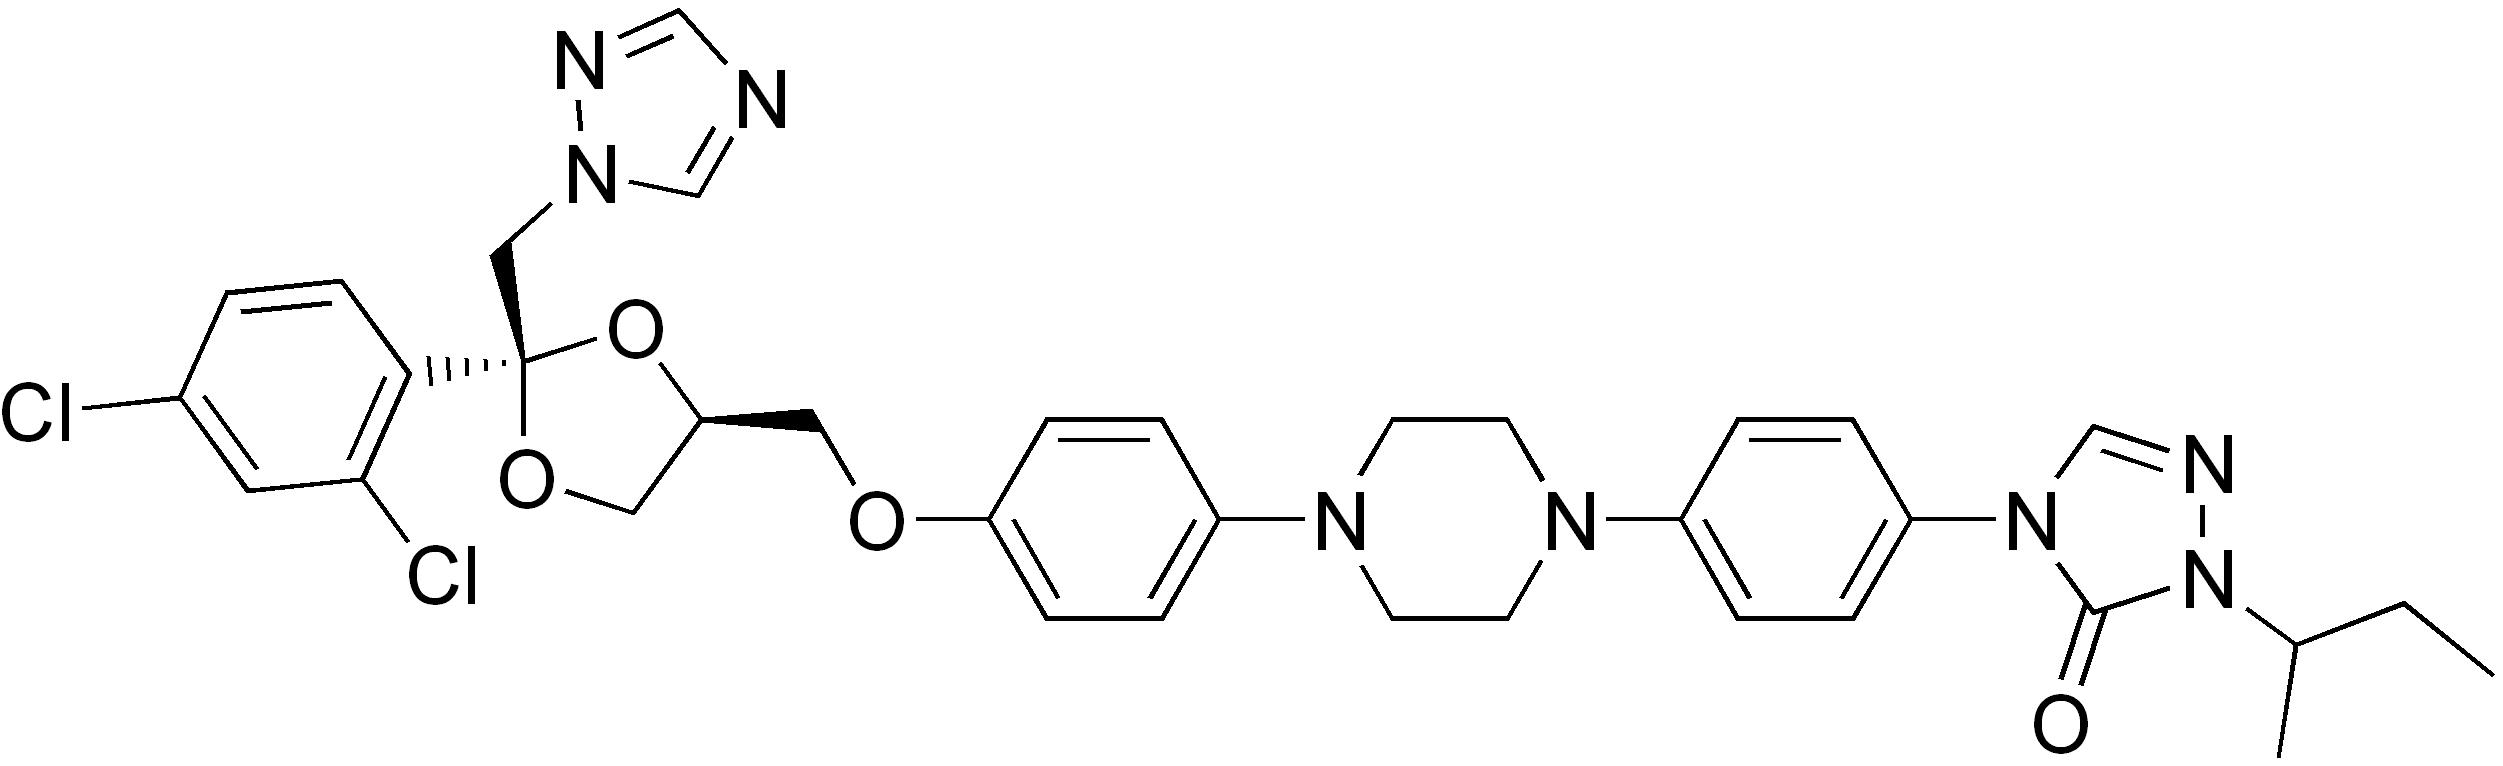 http://upload.wikimedia.org/wikipedia/commons/e/e1/Itraconazole_structure.png